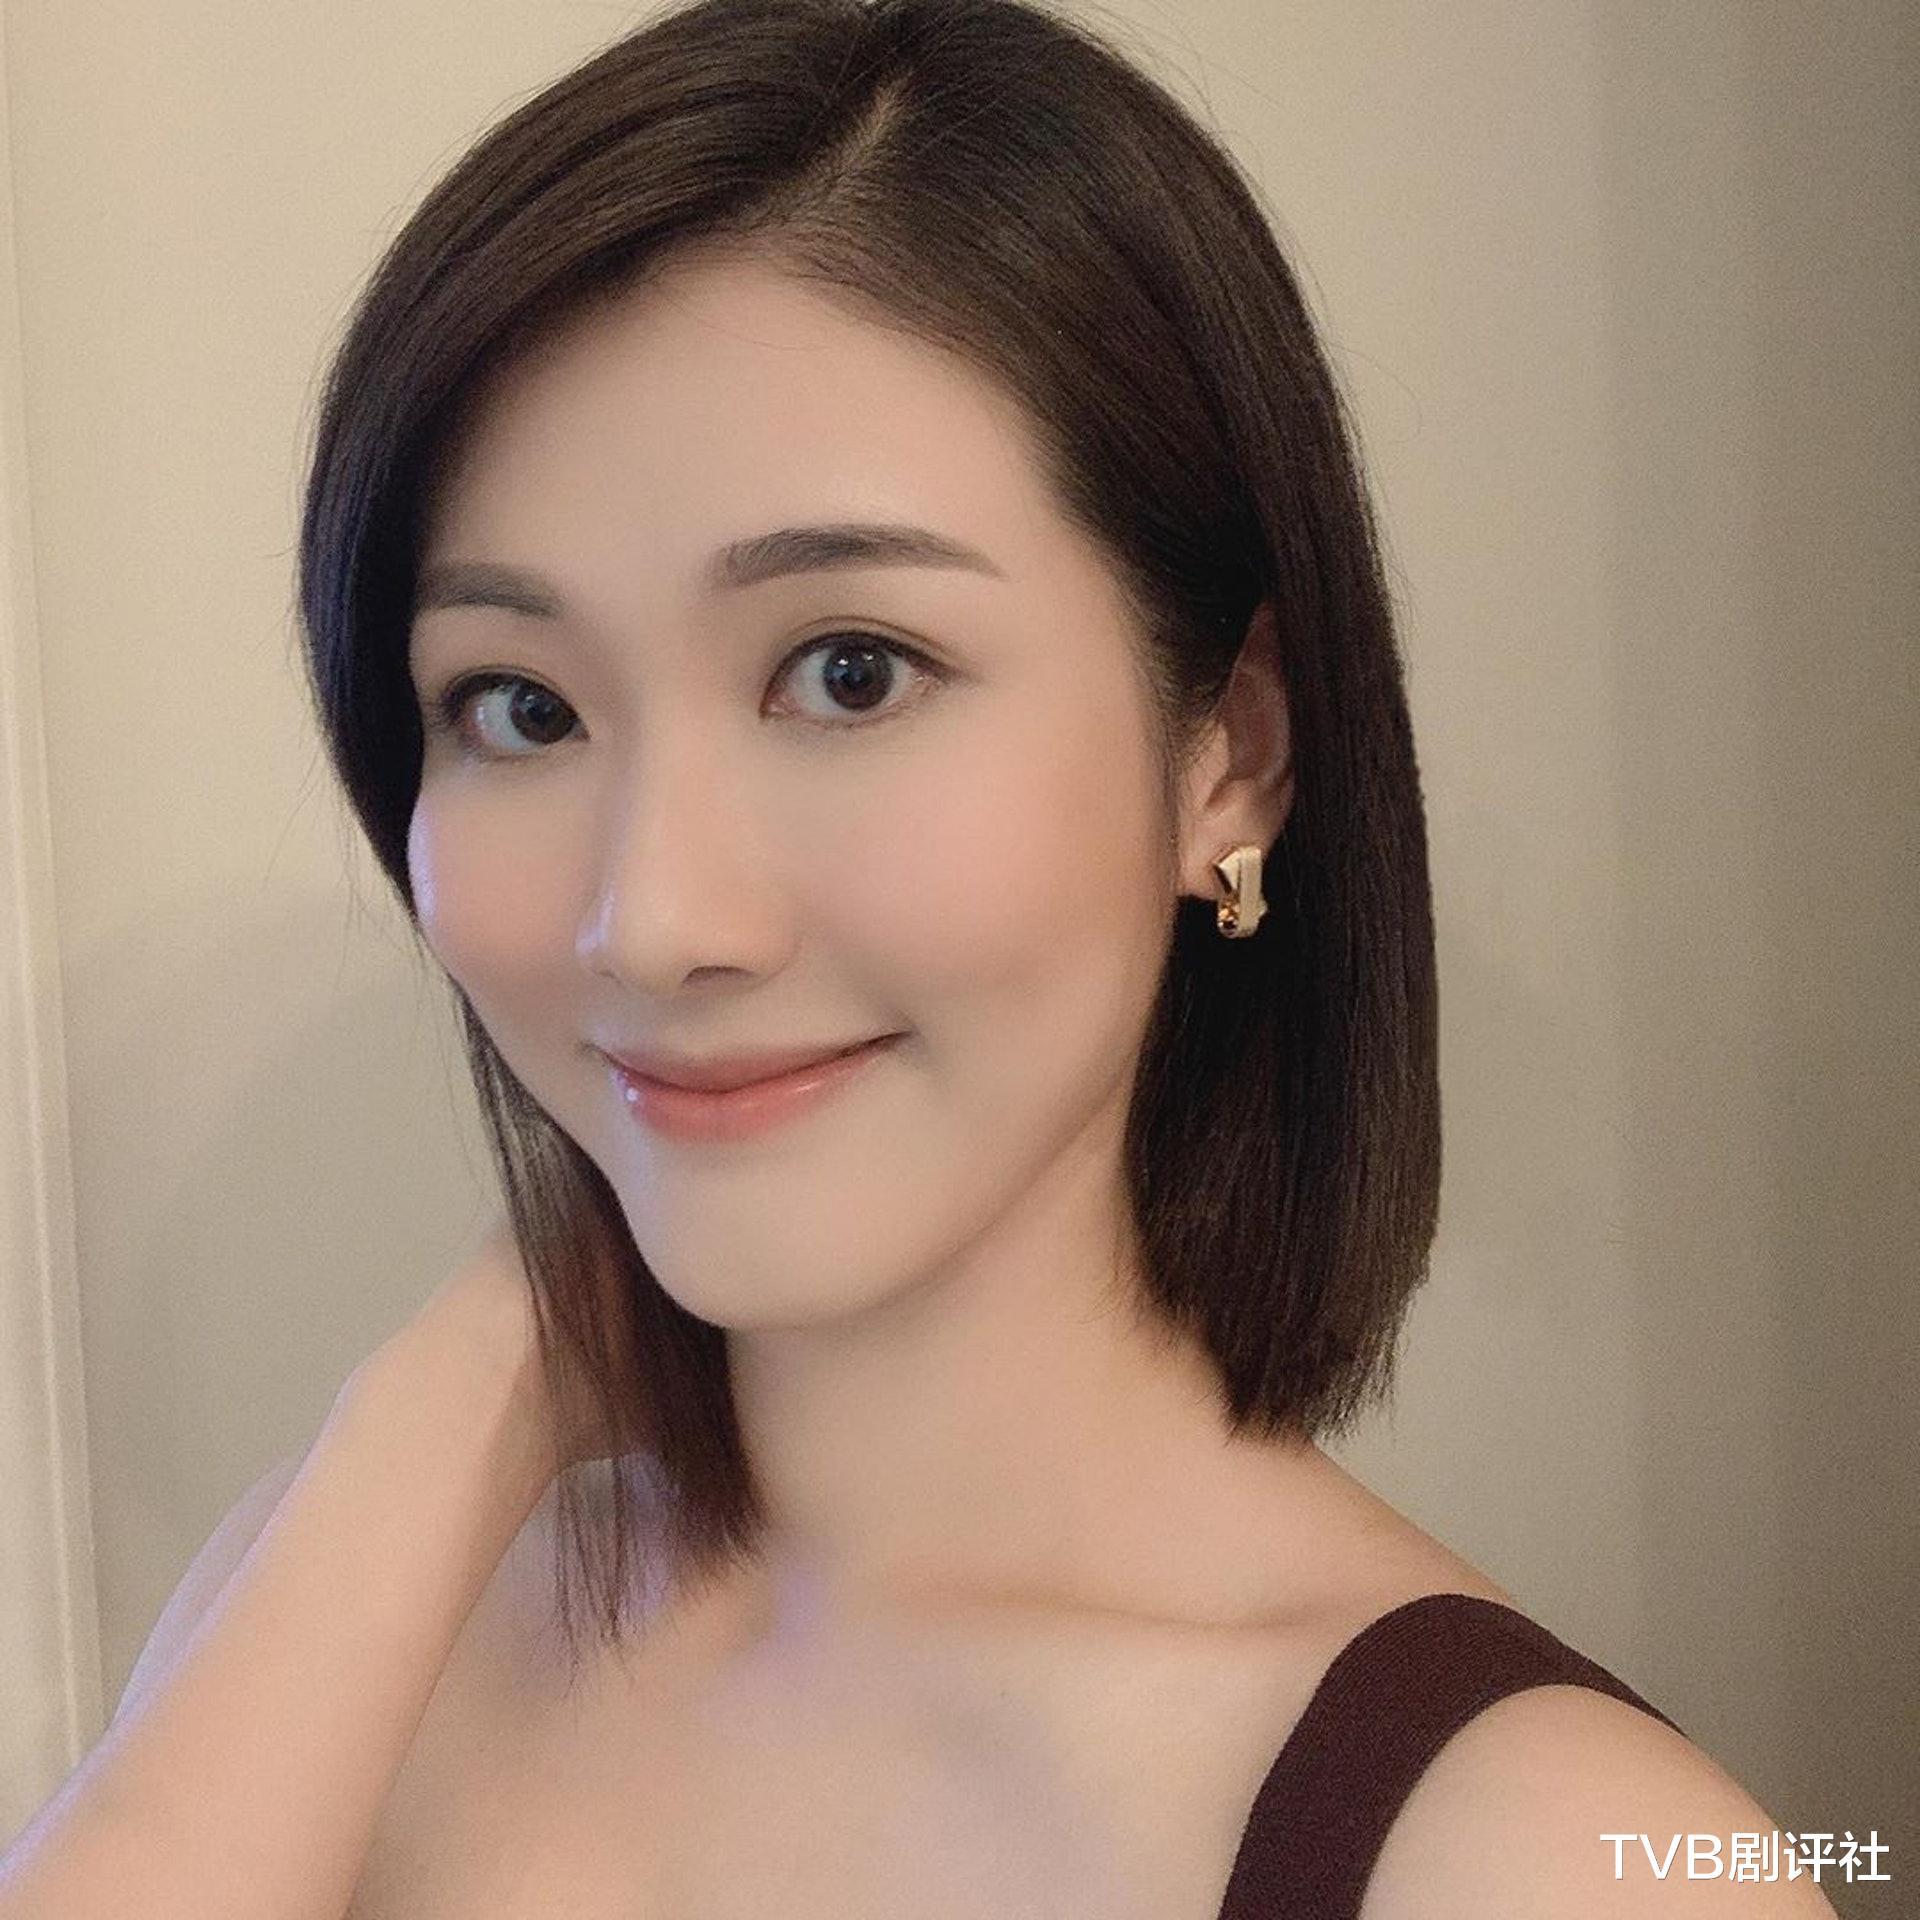 TVB力捧四小花做新劇女主角, 陳曉華僅入行兩年就擔正女一-圖8